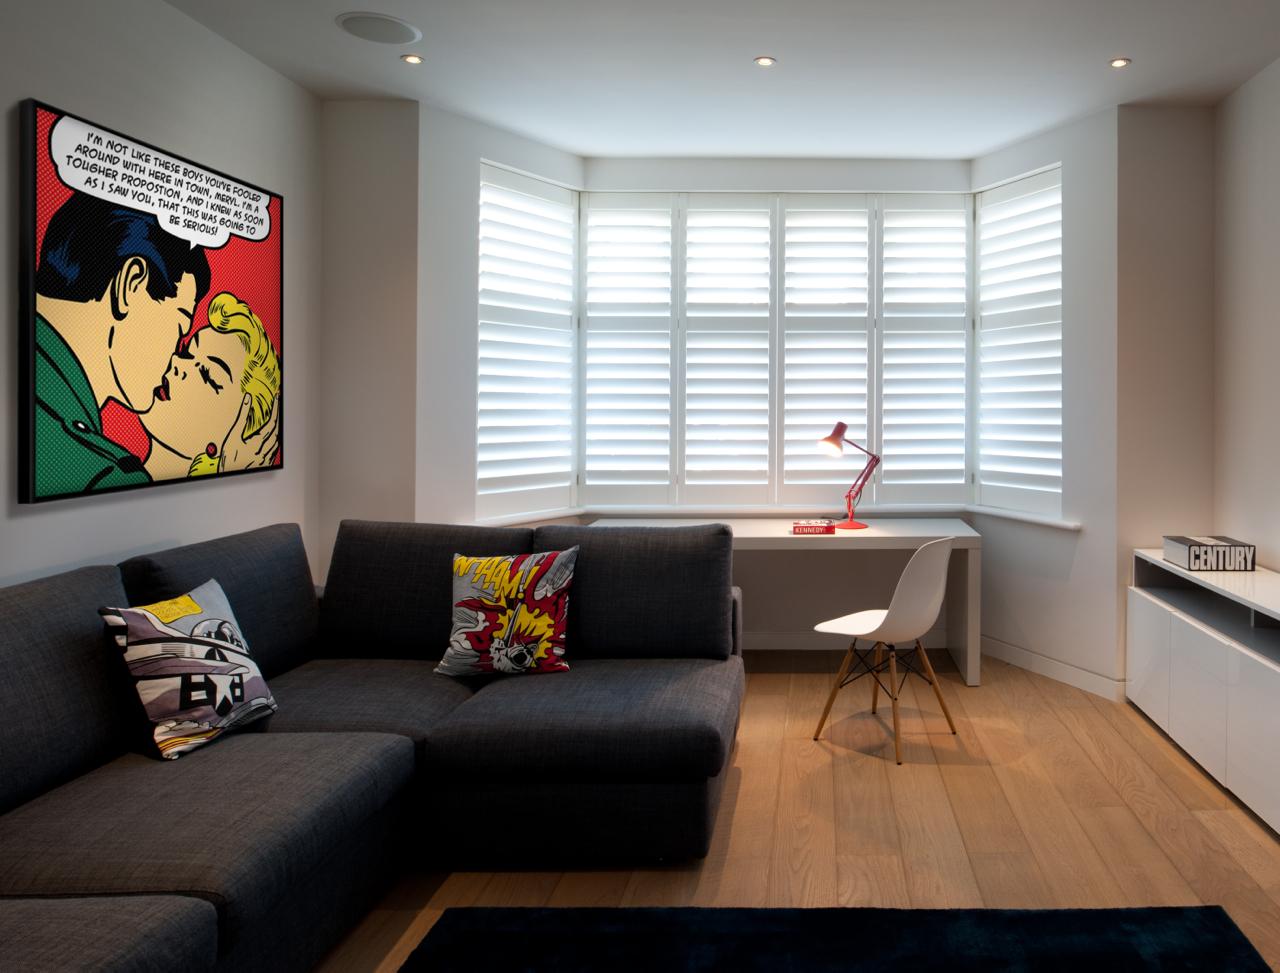 Pop art overlooks an office in a Hampstead interior